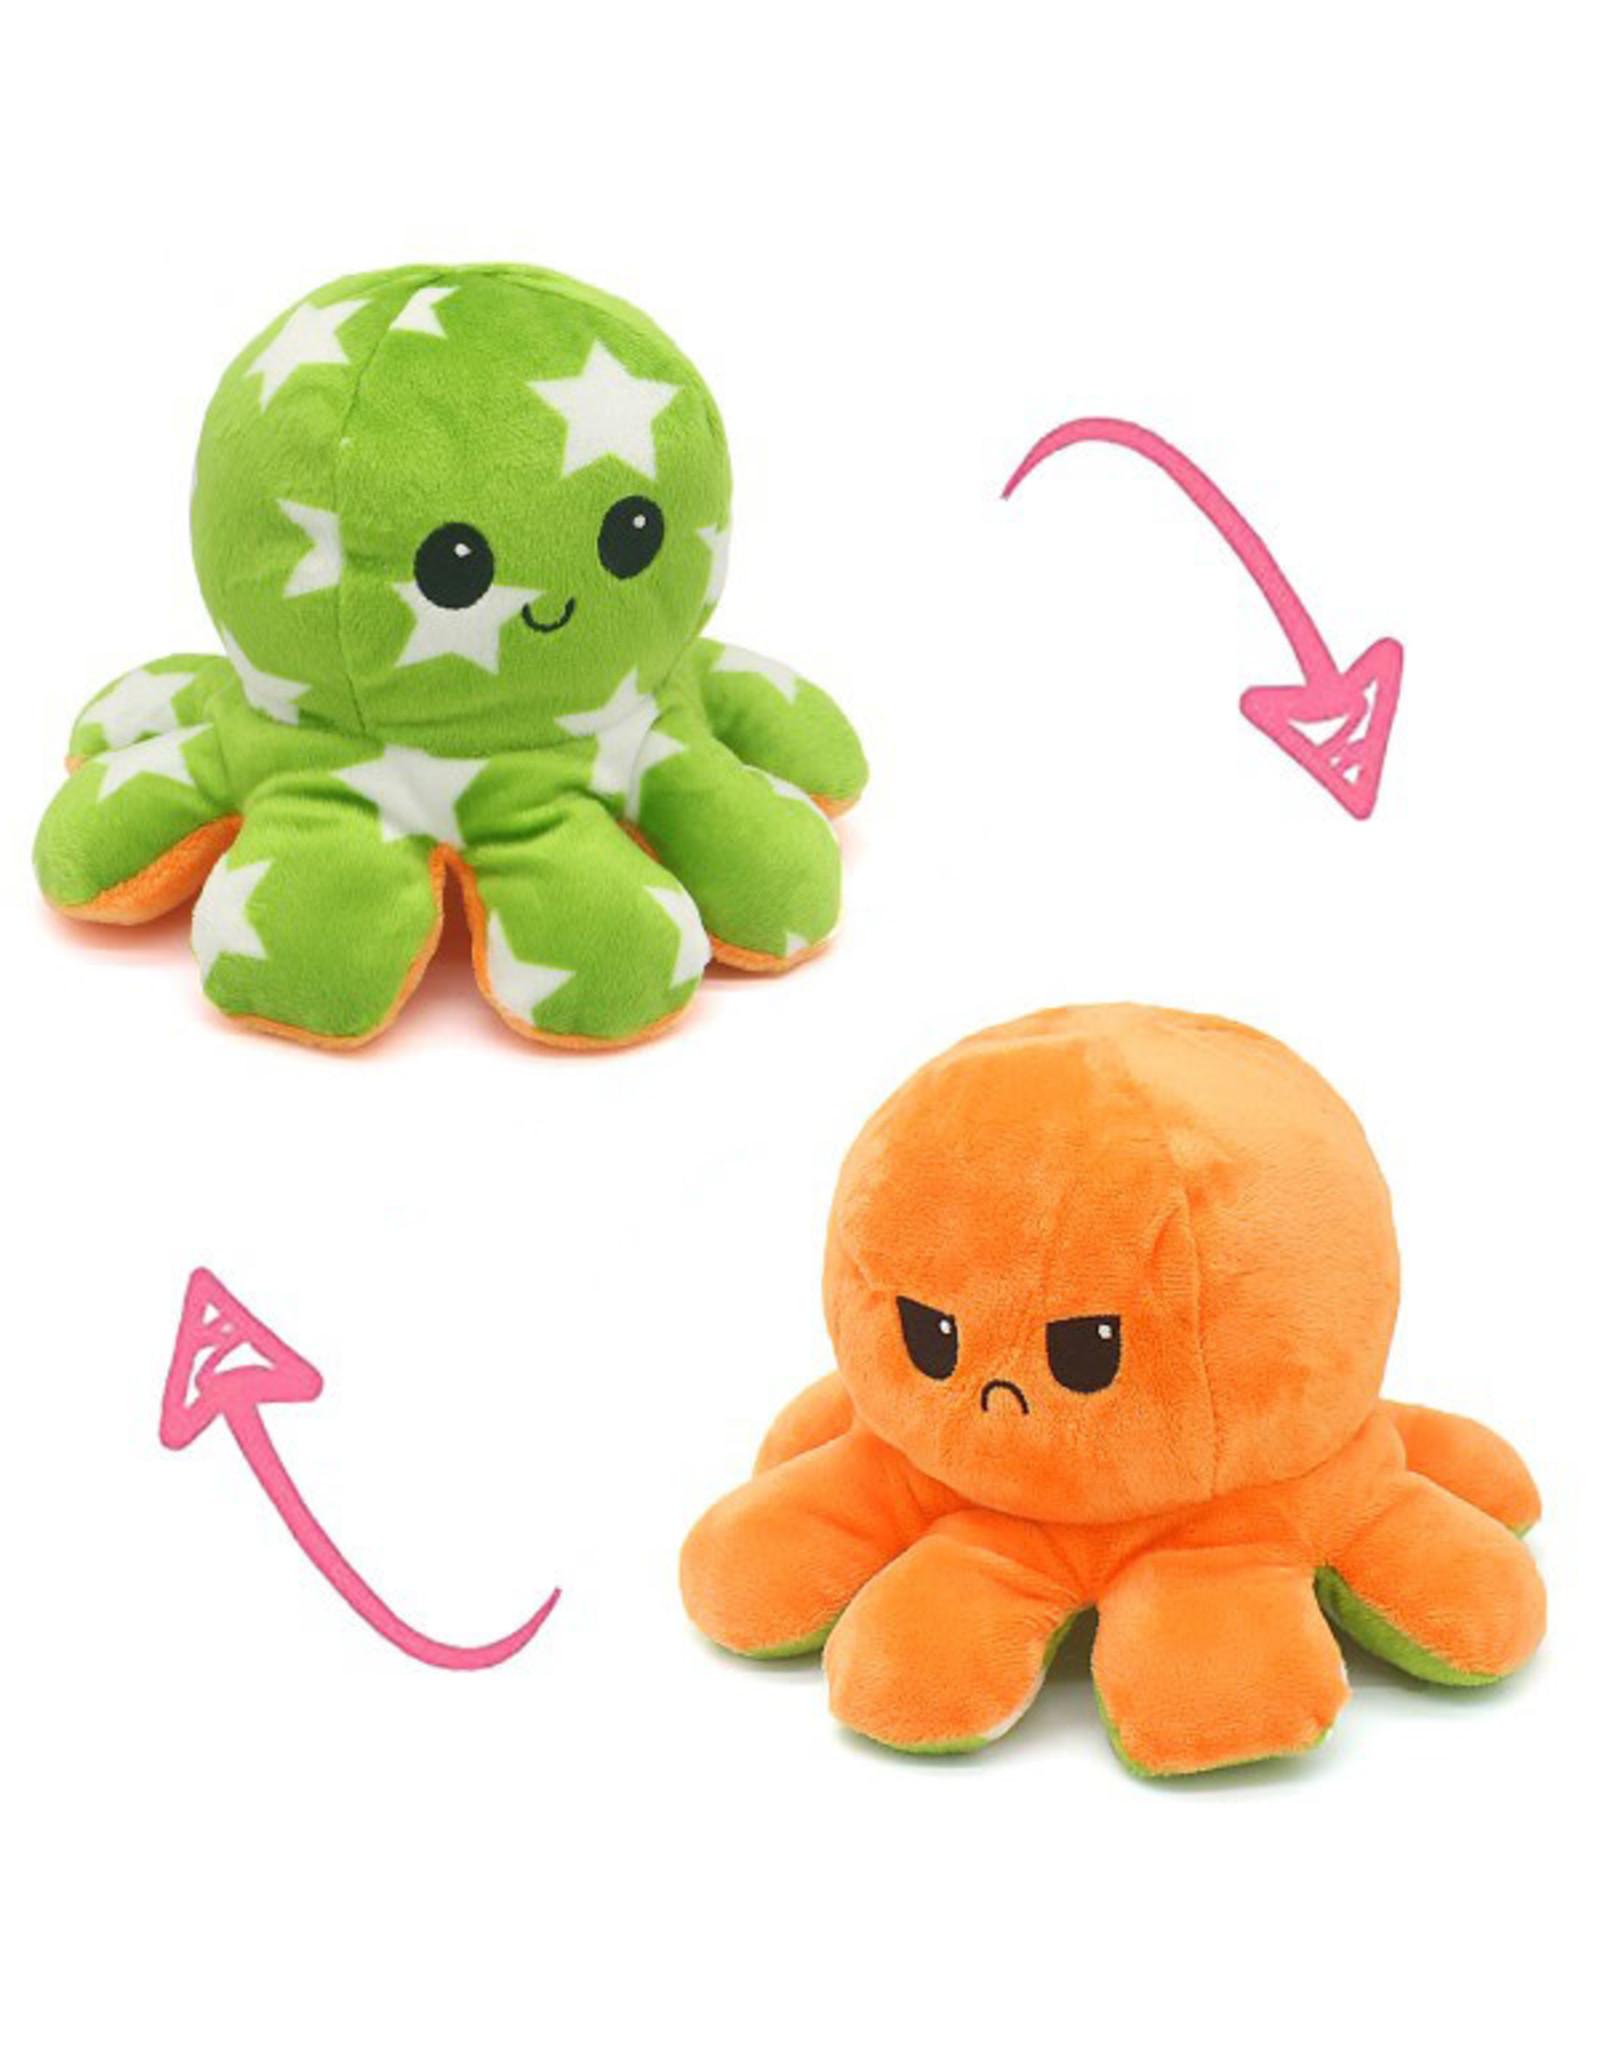 Omkeerbare octopus ster groen/oranje